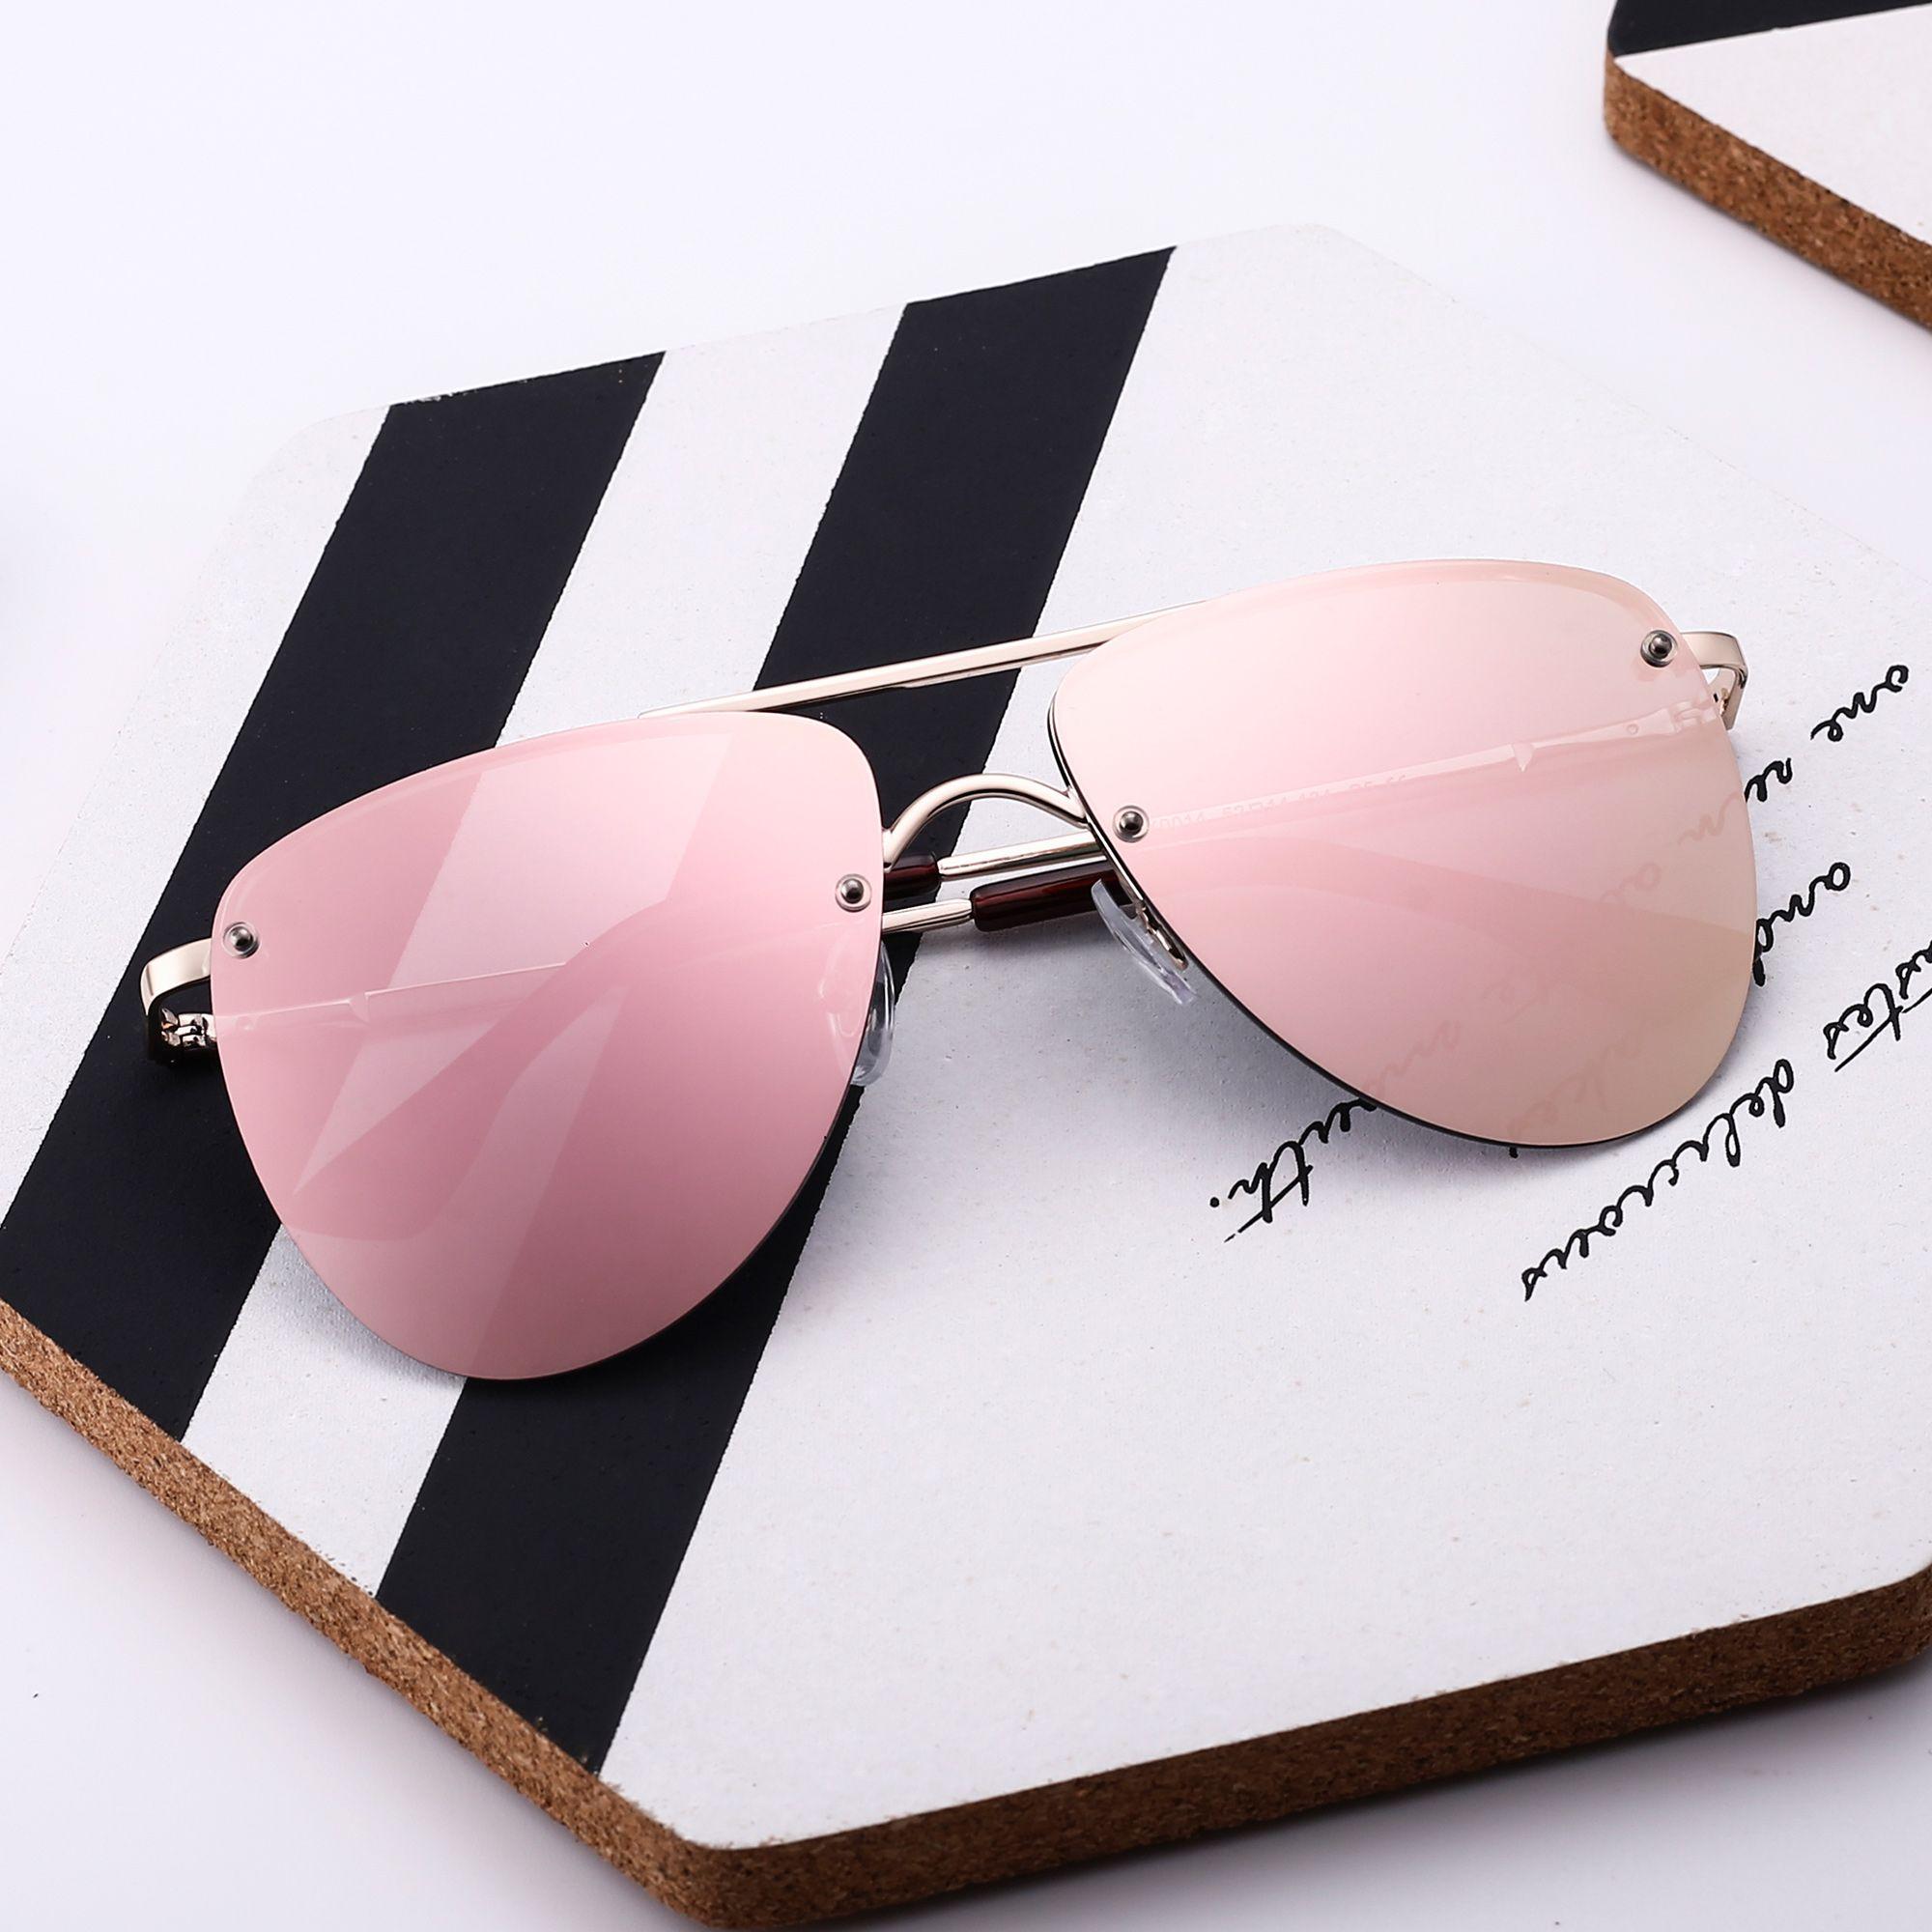 ba931ed9b9 Compre Envío Gratis Gafas Promocionales Polarizadas Shades Lentes De Sol A  $7.01 Del Glassessol | DHgate.Com